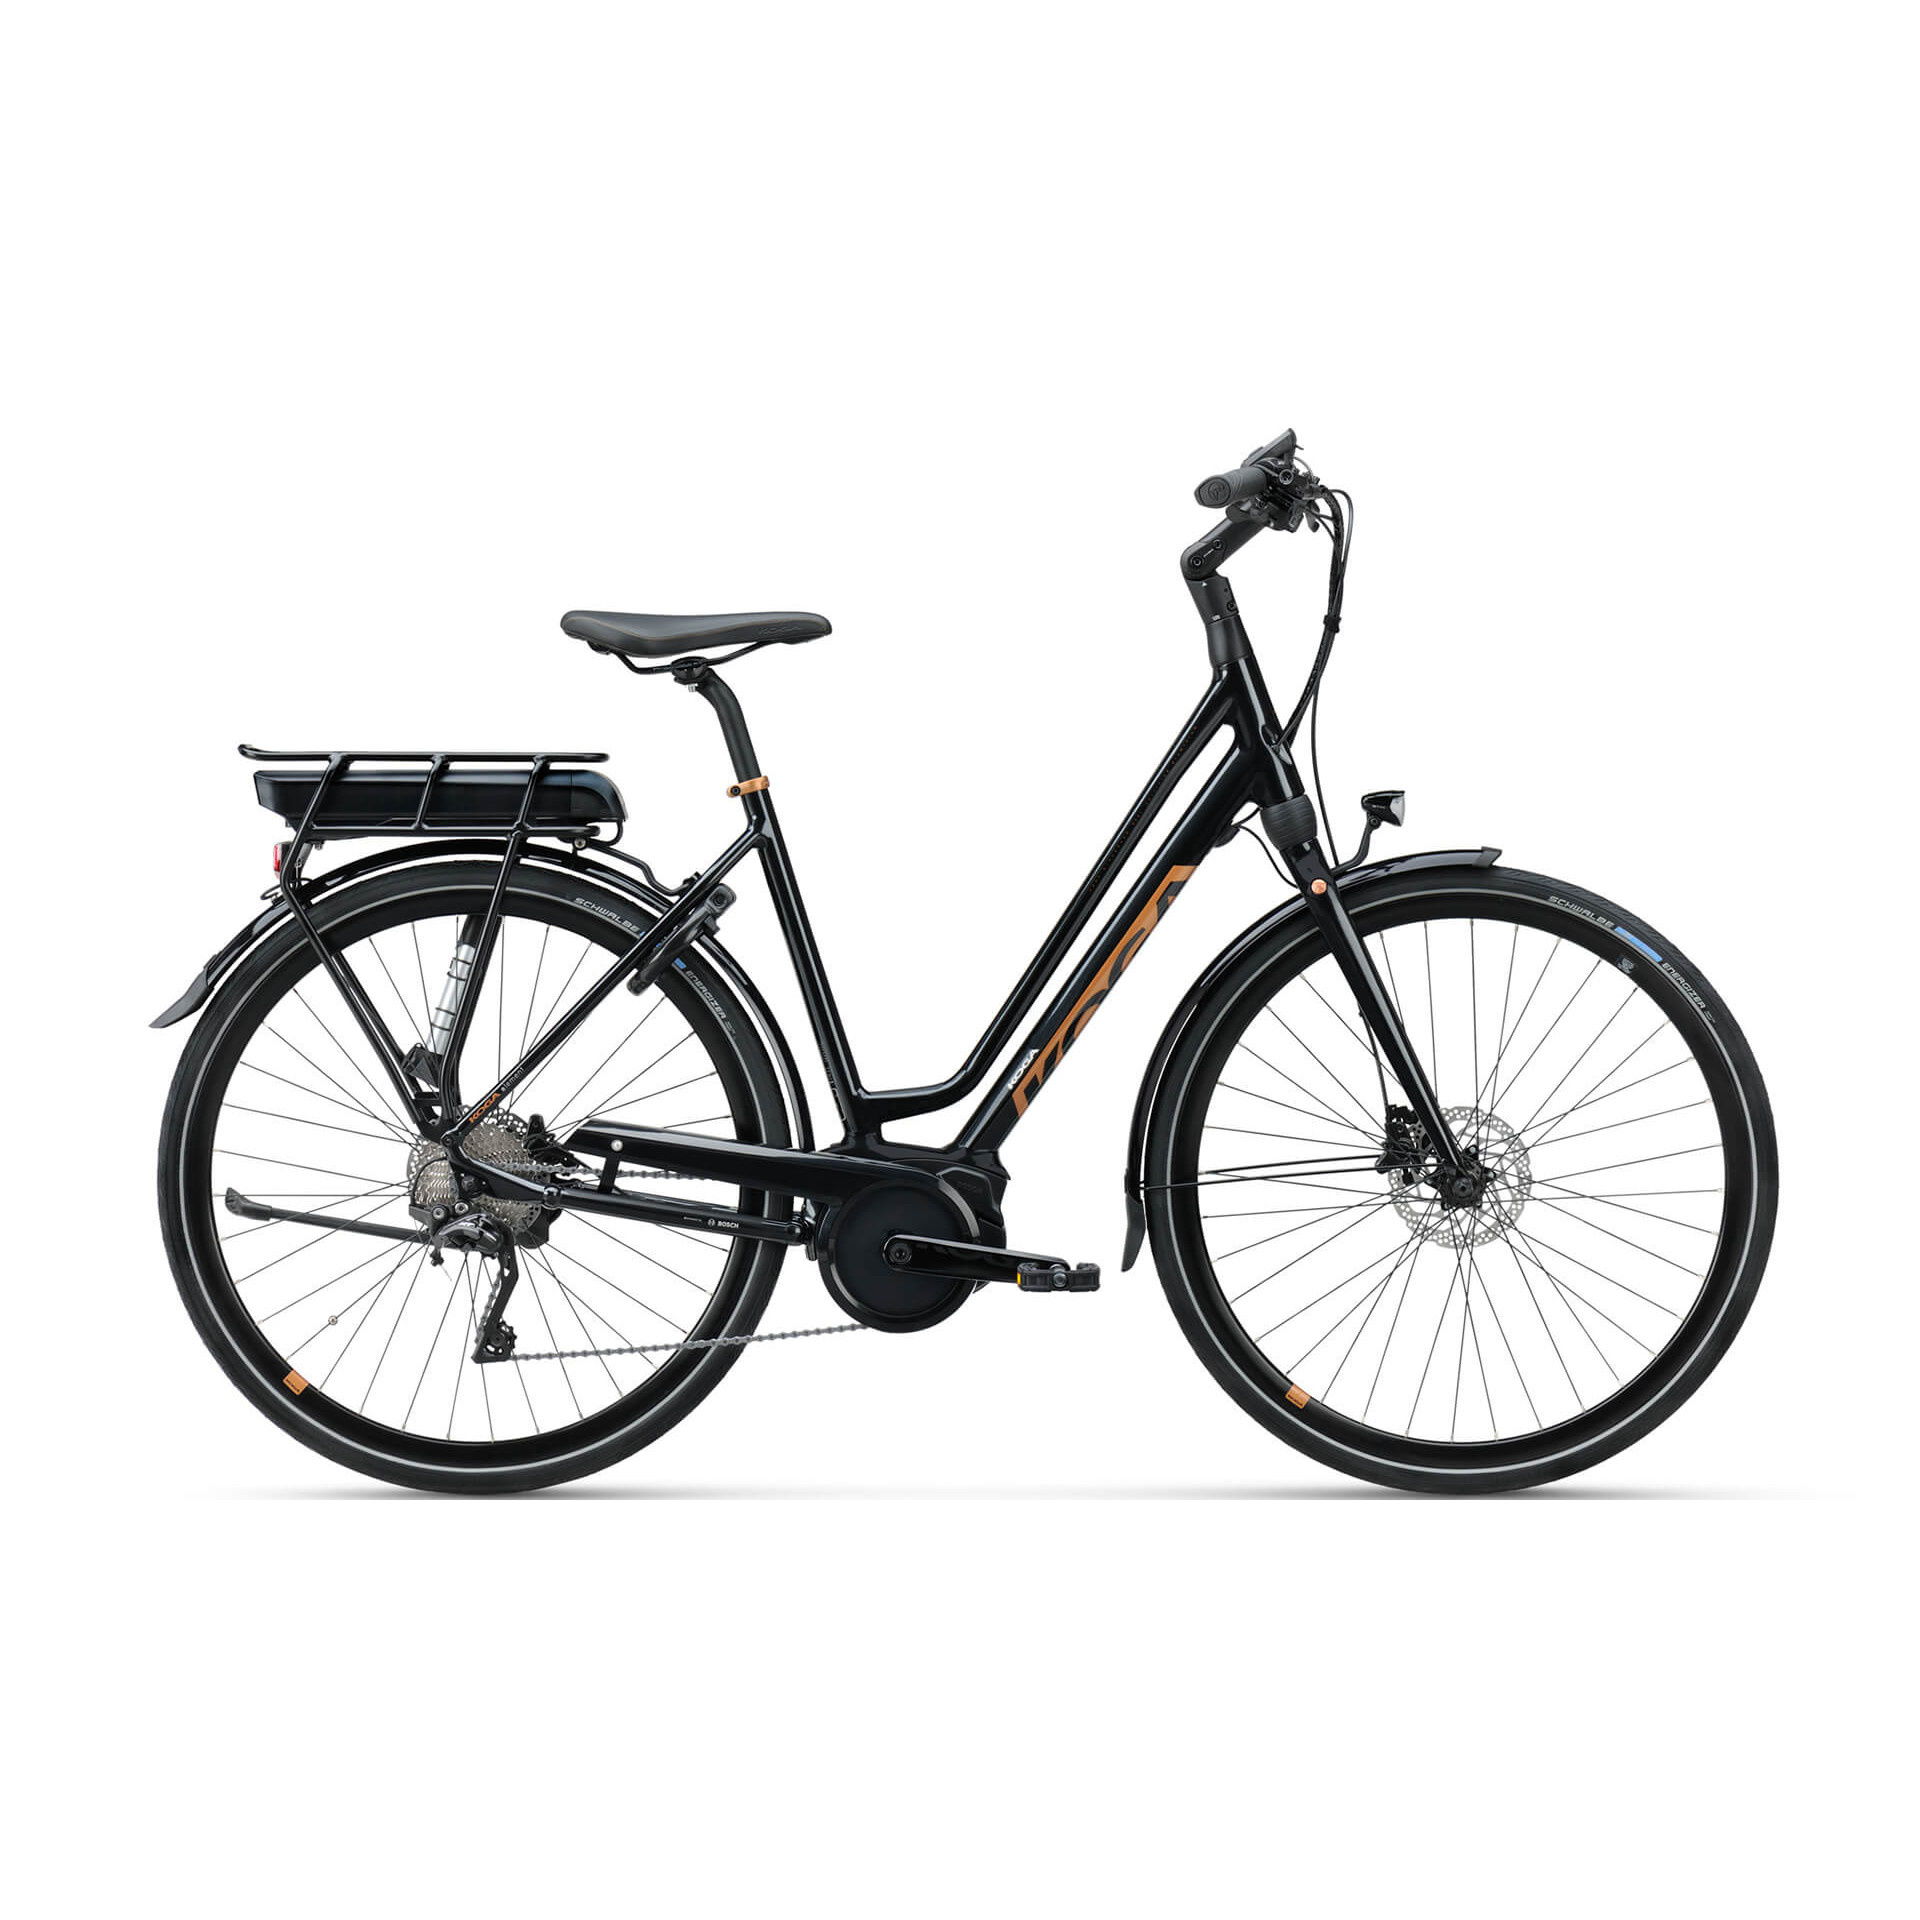 Accu en lader voor Koga E-Lement e-bike